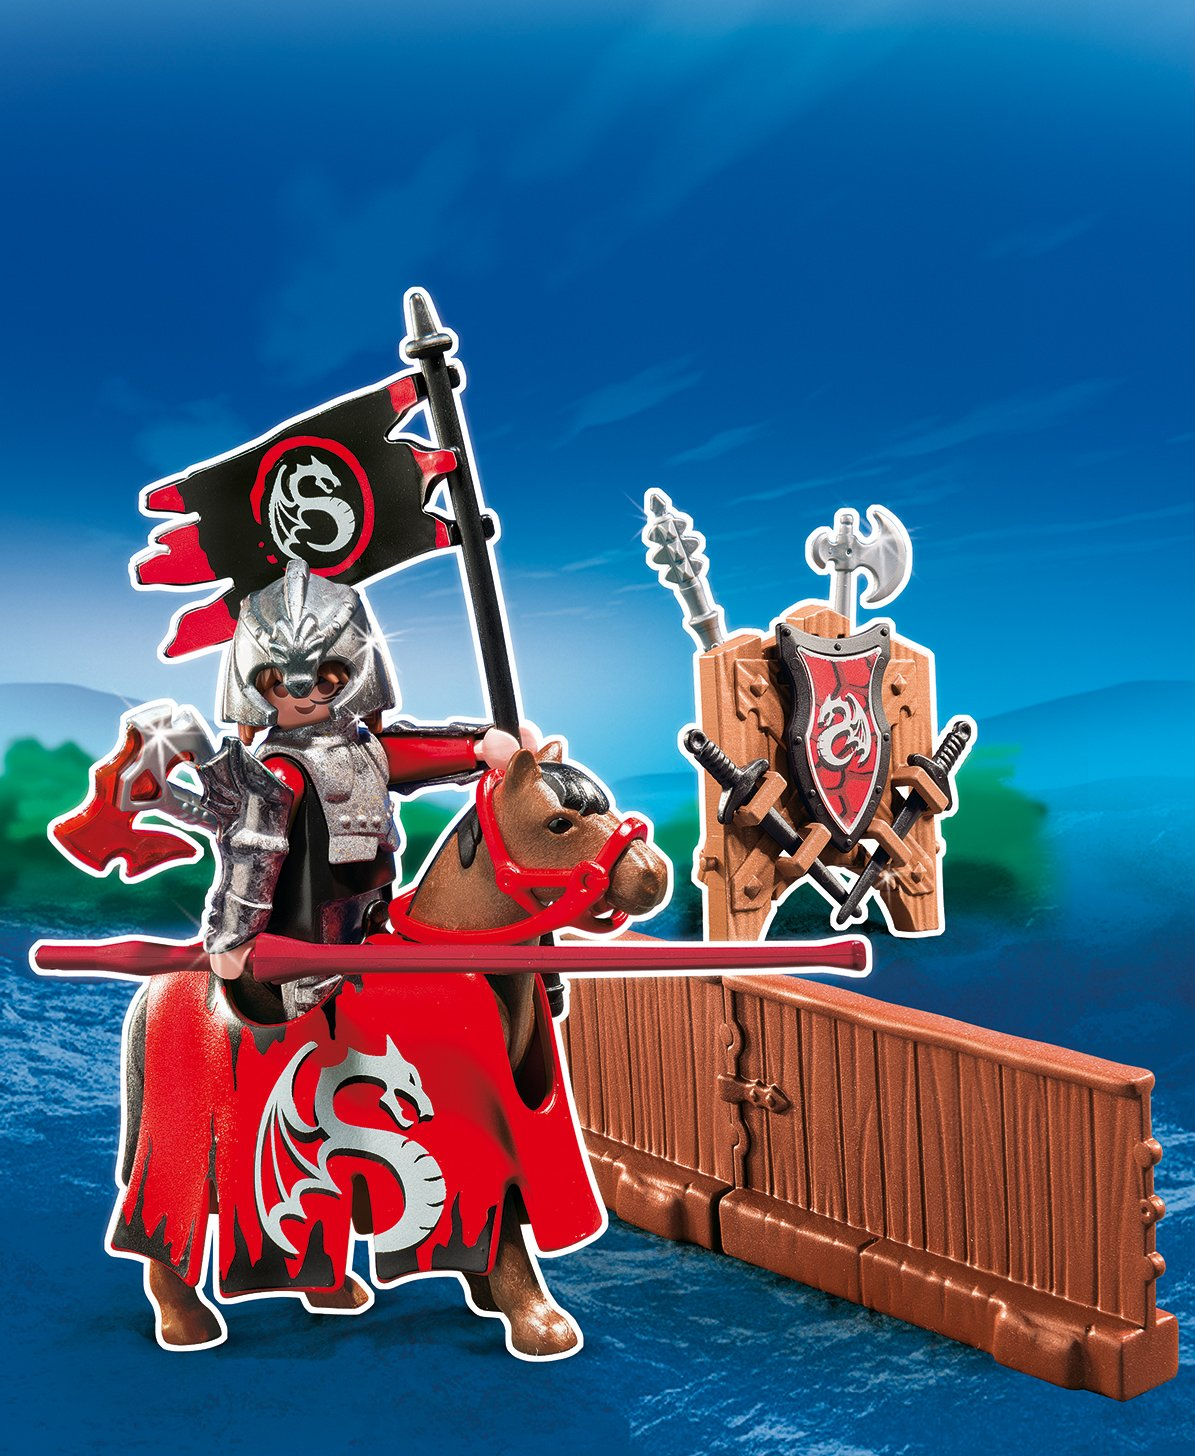 PLAYMOBIL/® Dragon Tournament Knight Play Set